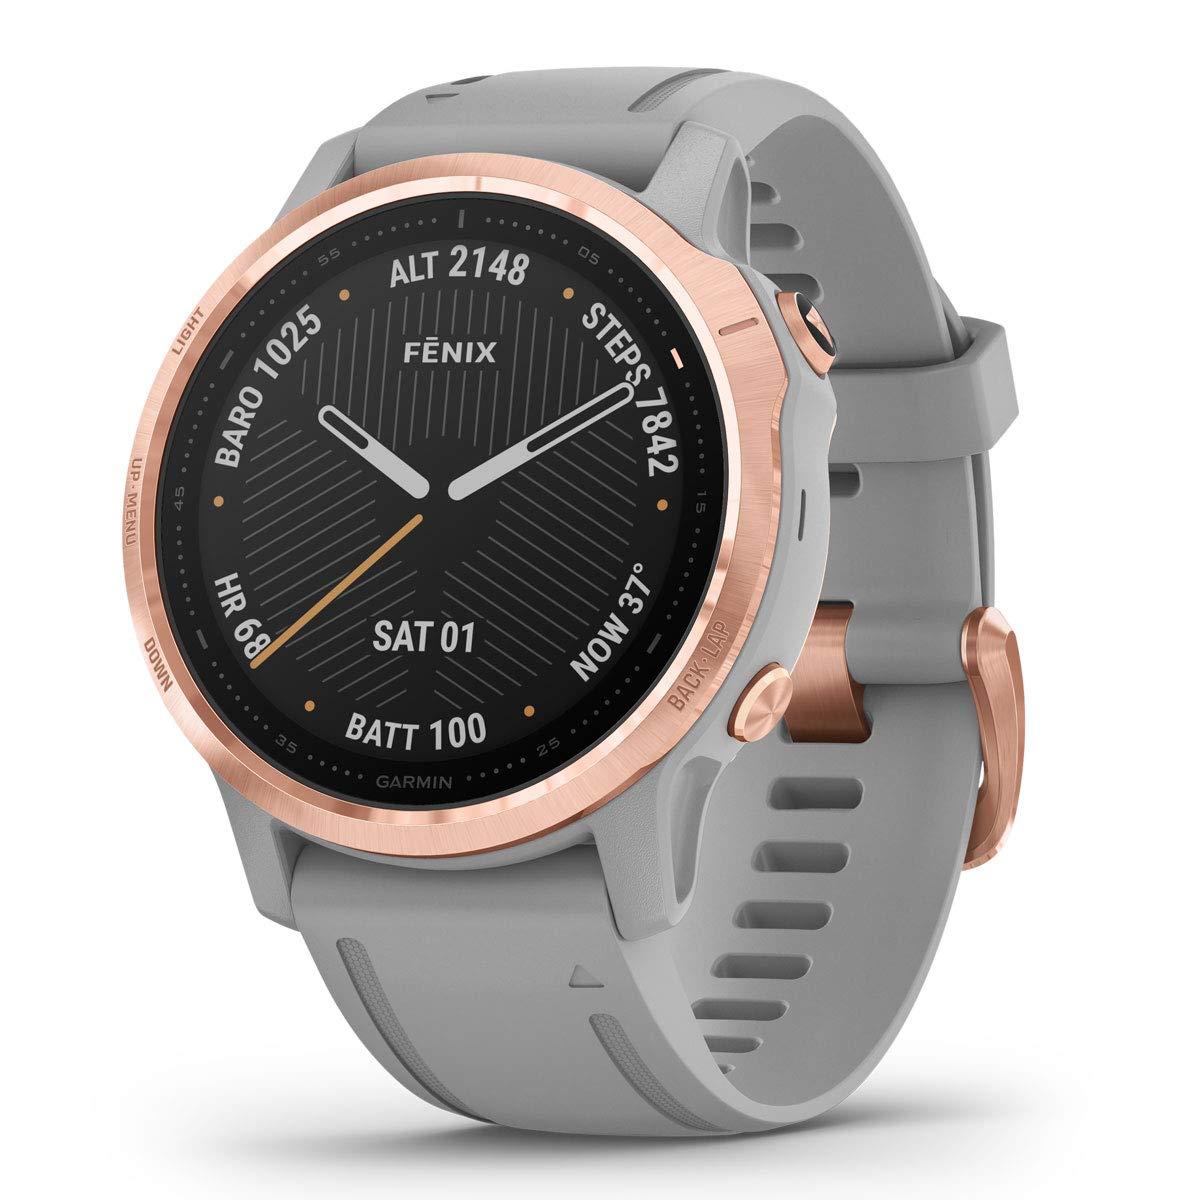 Garmin-Smartwatch-wasserdicht-fenix-Spoertuhr-100m-Wassertiefe-rosa-rosé-grau-digital